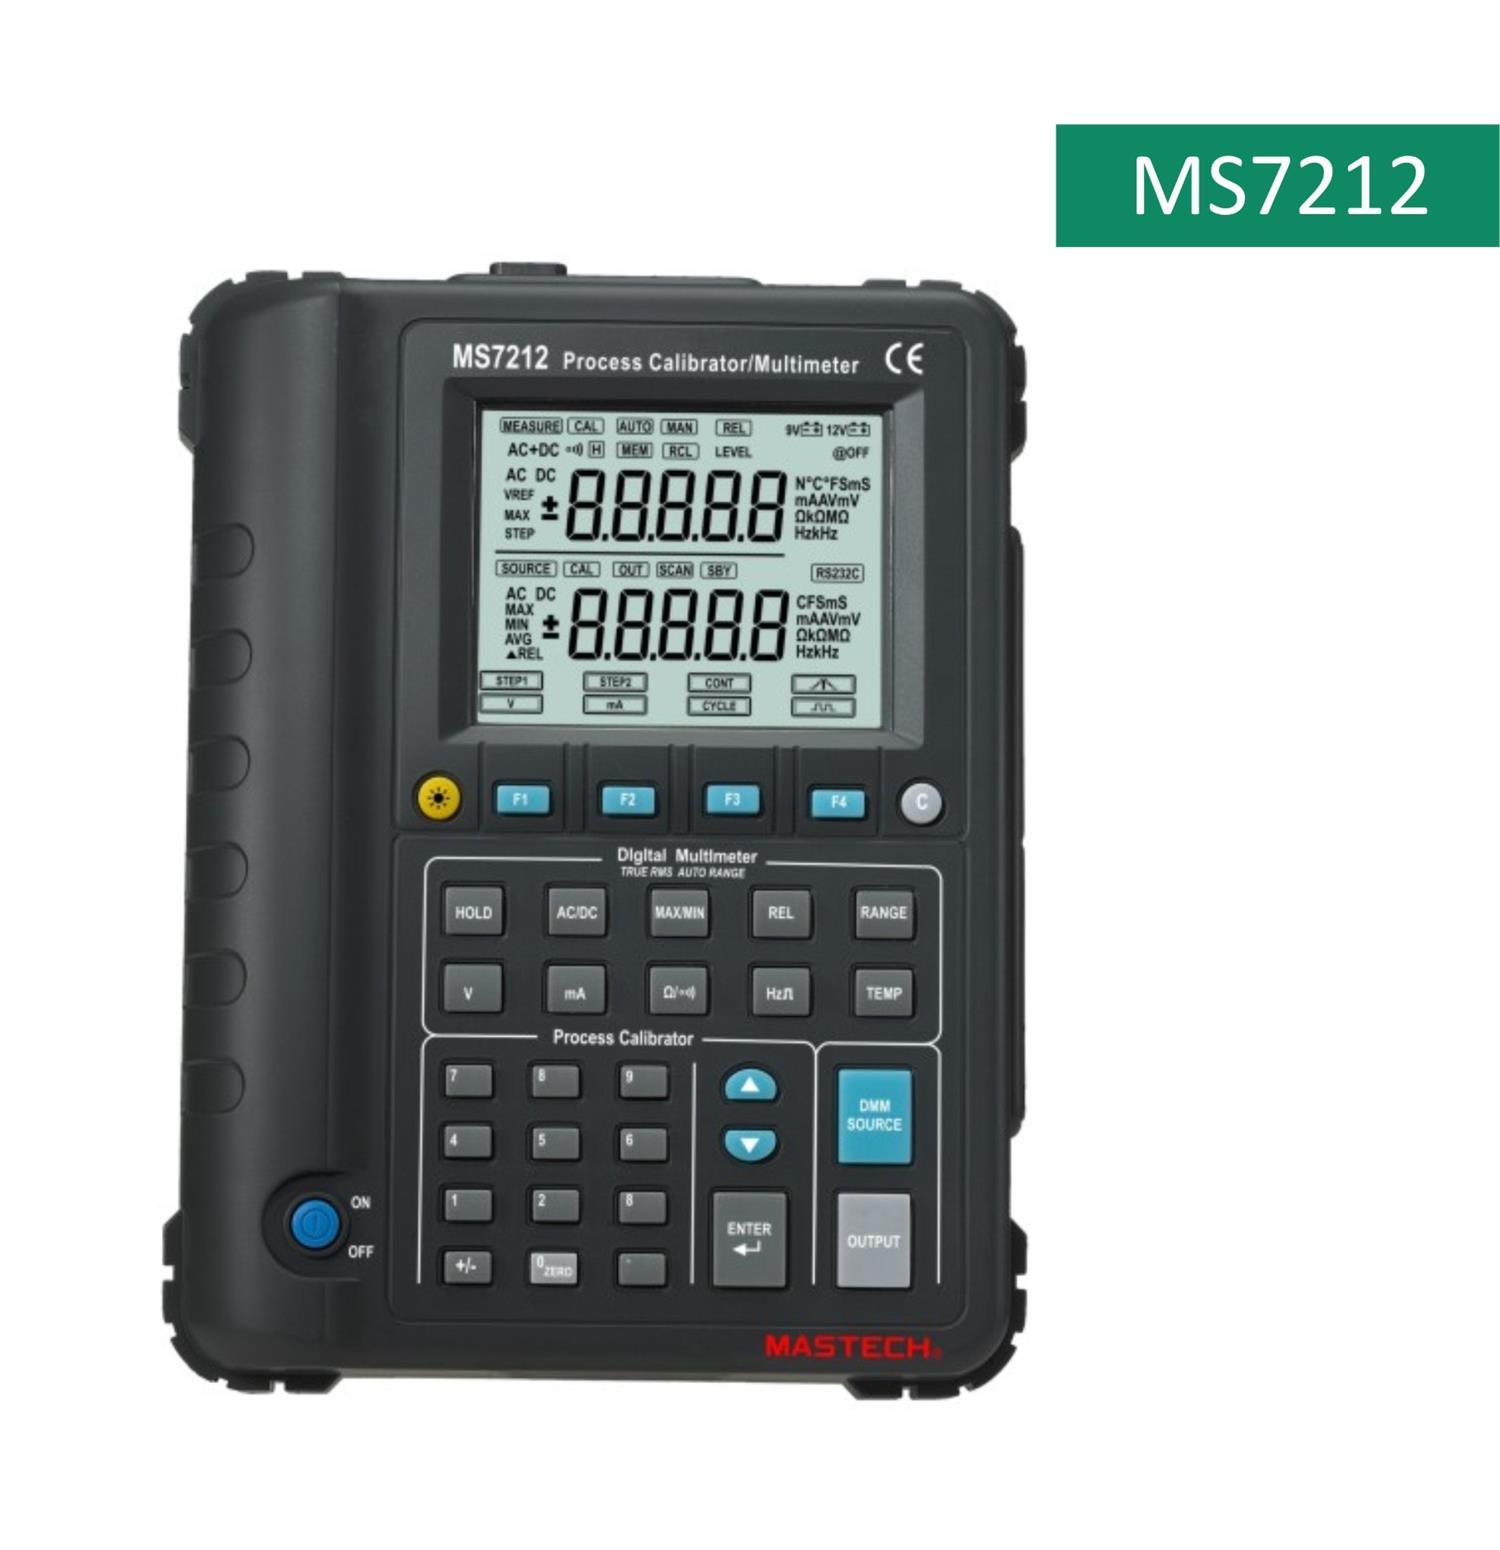 MS7212